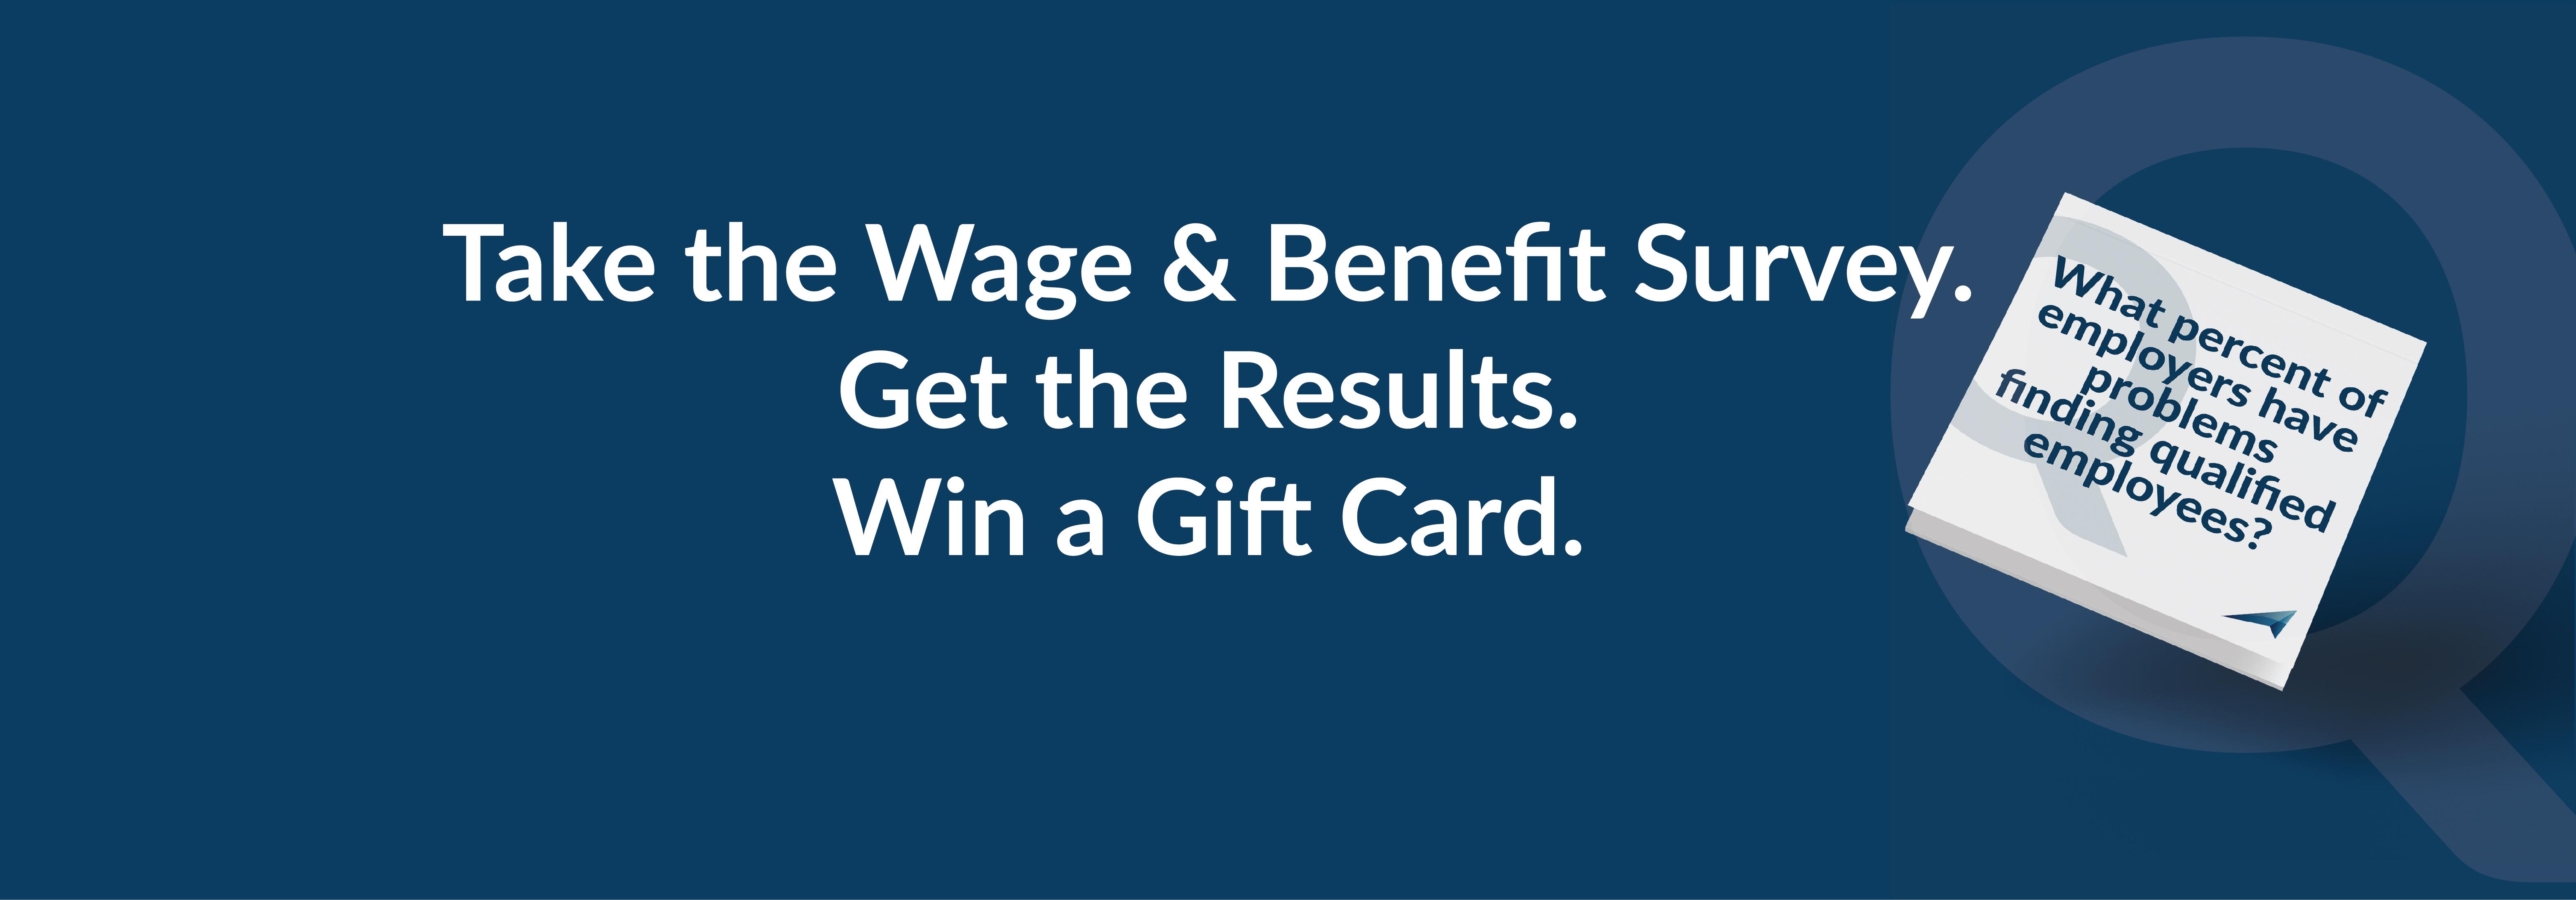 Wage & Benefit